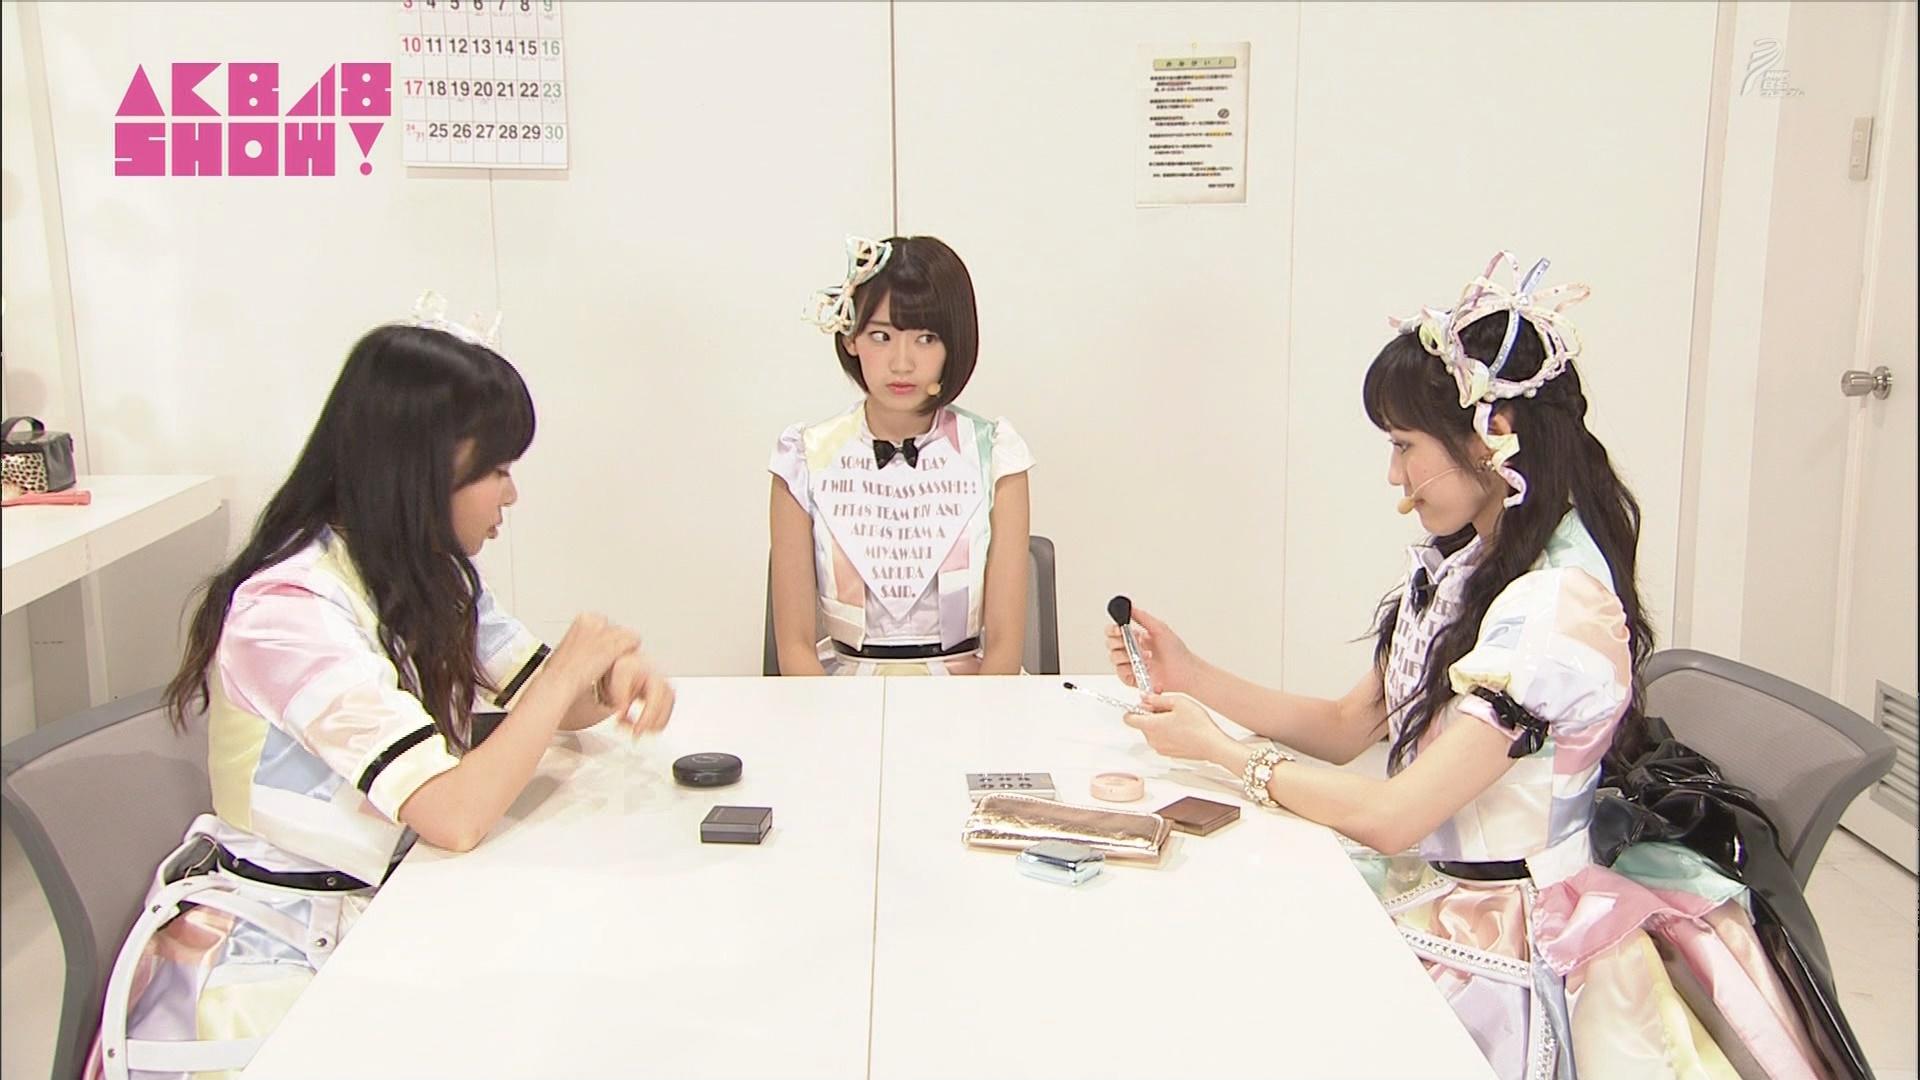 AKB48SHOW 心のプラカード 宮脇咲良 20140830 (2)